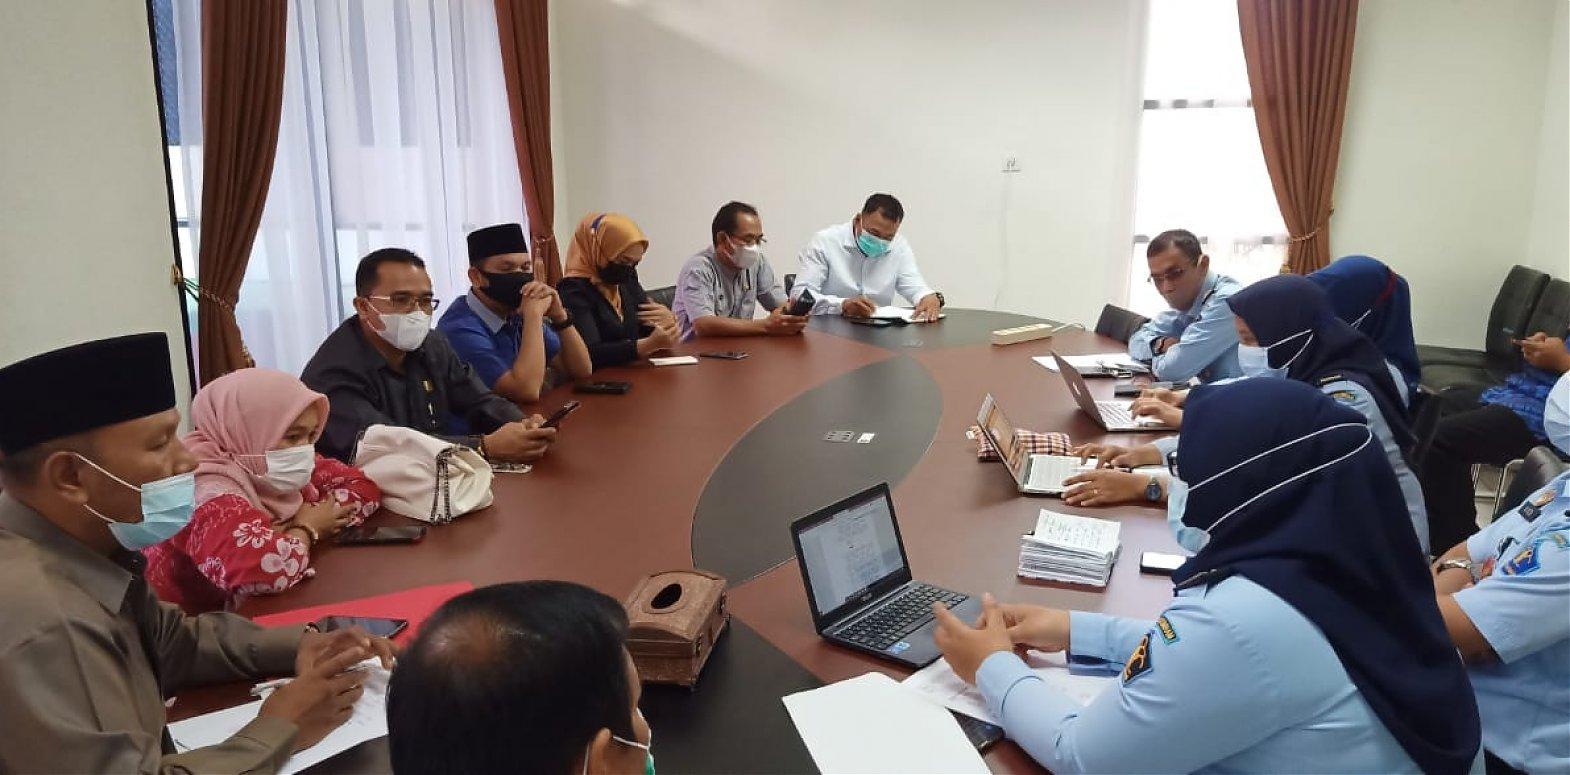 Terkait Mekanisme Proses Penyusunan Ranperda, Komisi  III DPRD Agam Sharing Informasi Ke  Kemenkumham Sumbar